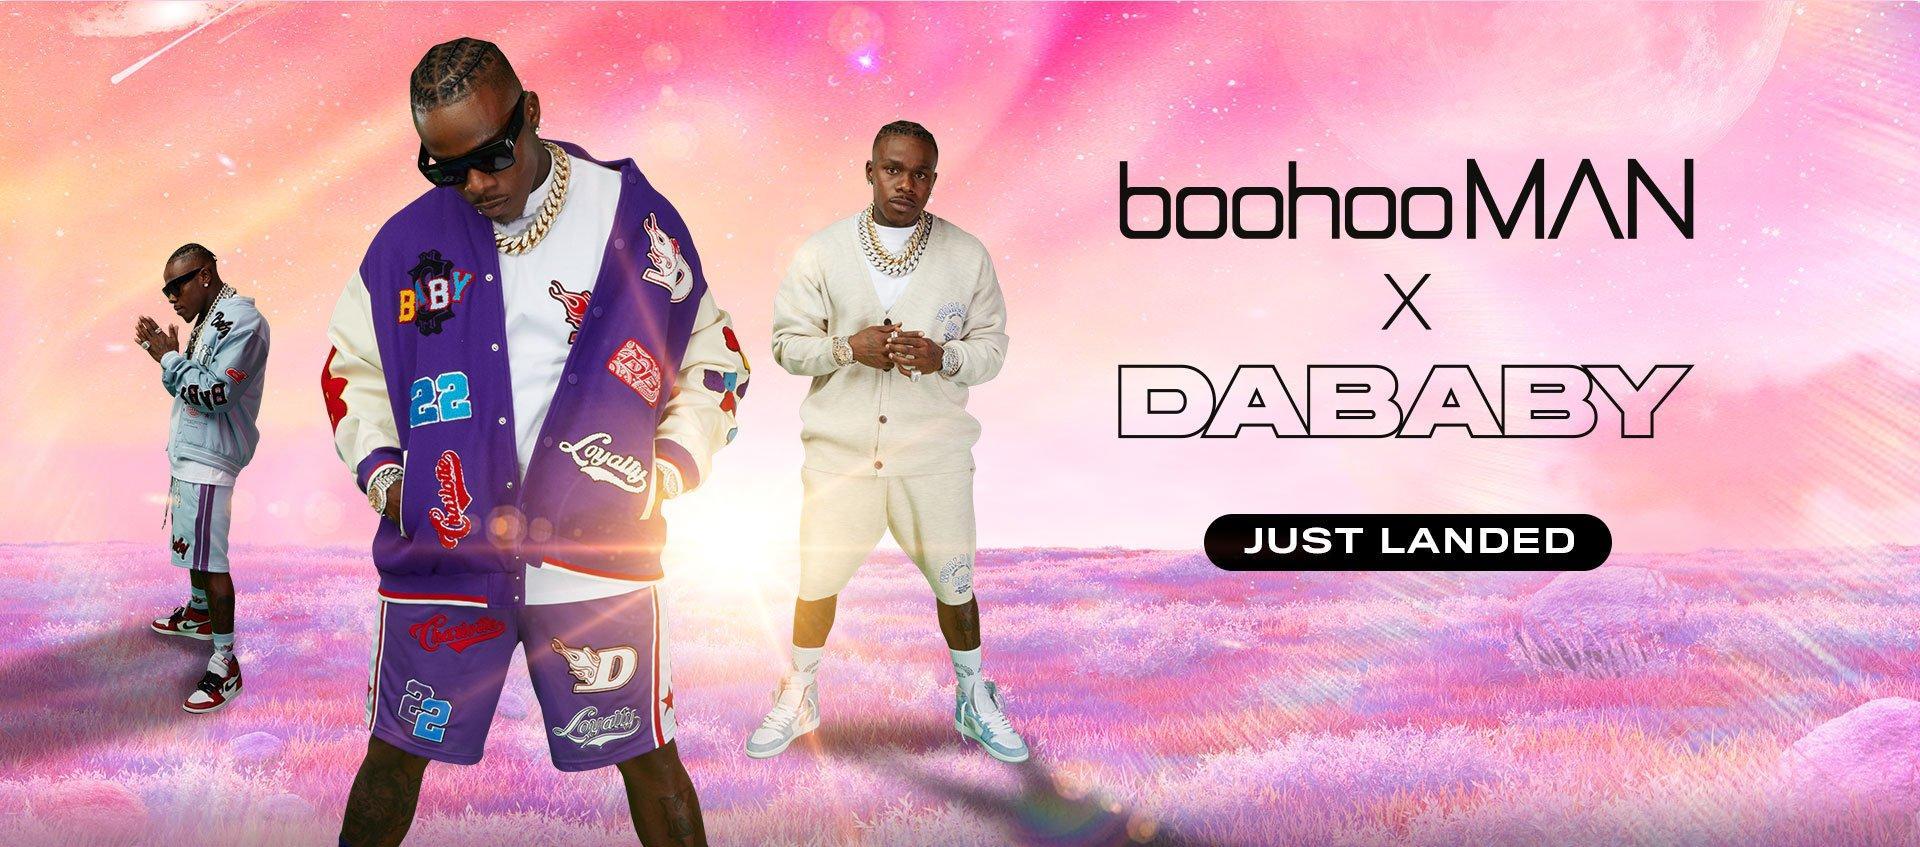 boohooMAN X DaBaby - Just Landed